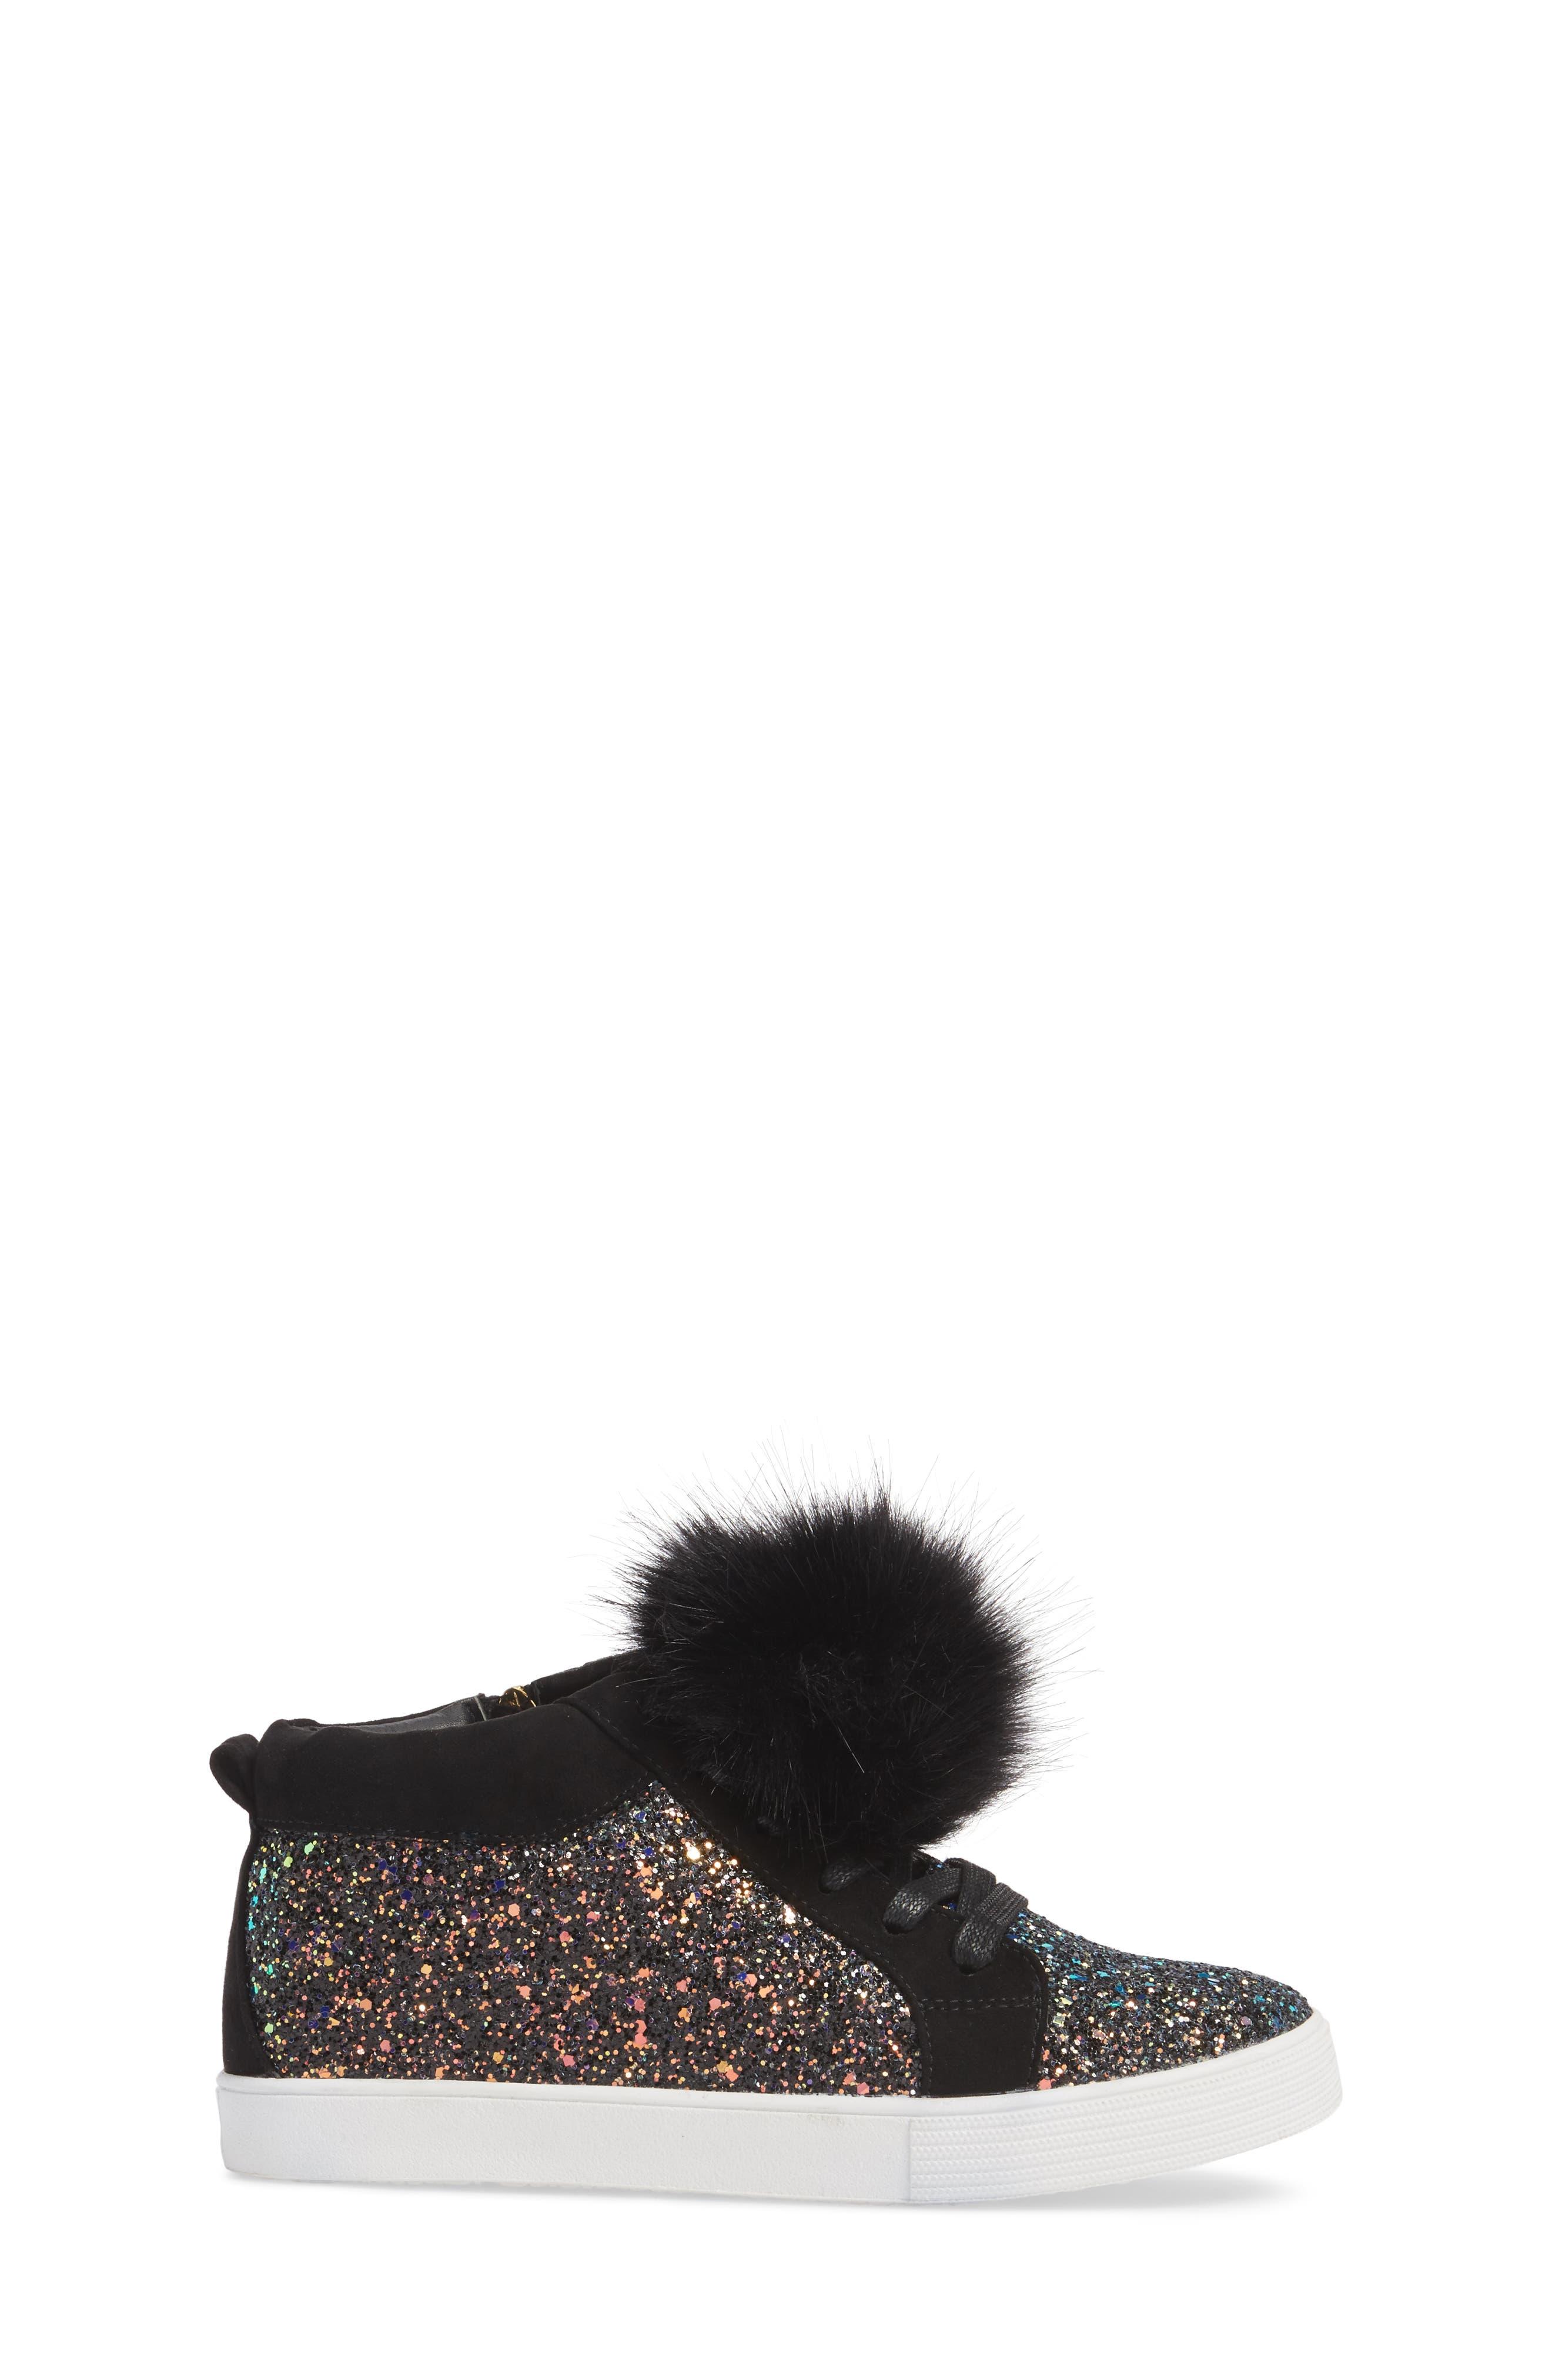 Bella Hira Faux Fur Glitter Pom Sneaker,                             Alternate thumbnail 3, color,                             Black Multi Chunky Glitter